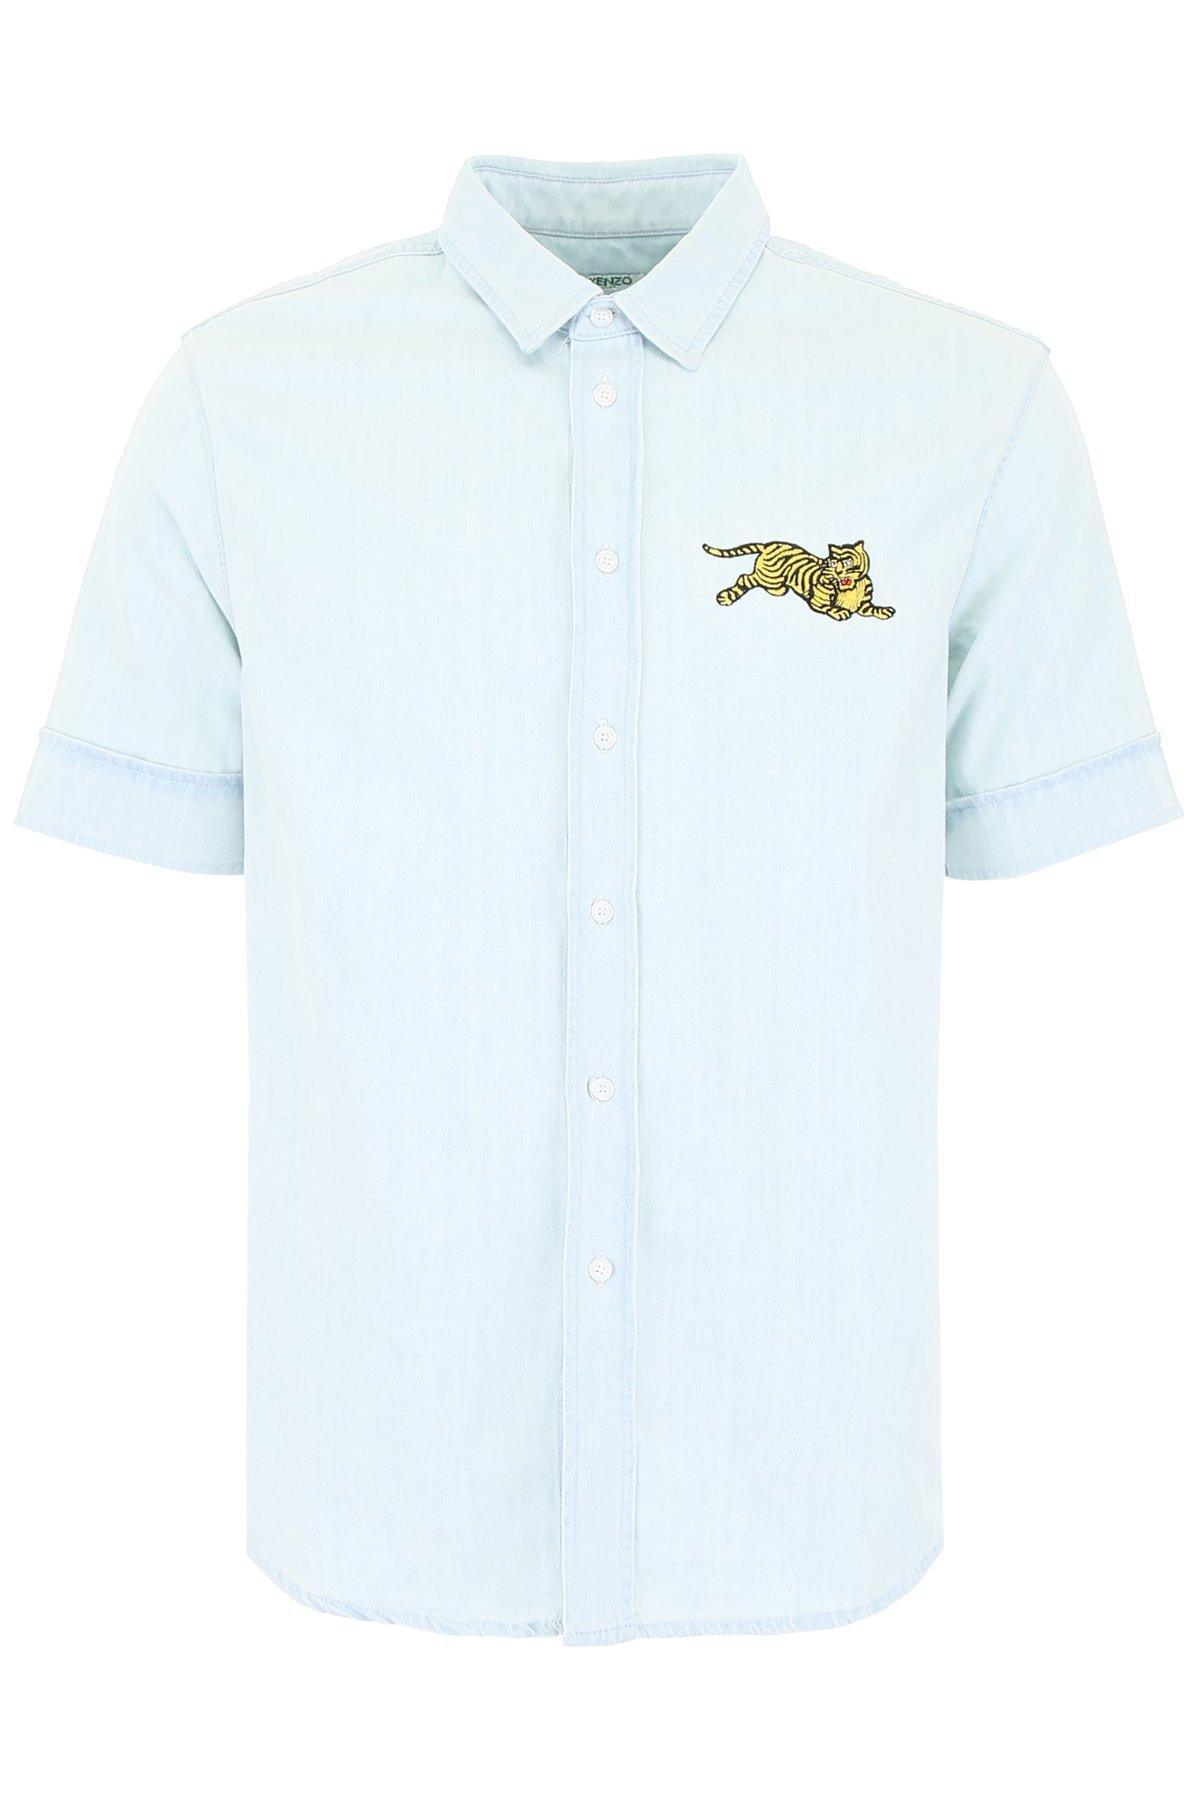 6dfb658b KENZO Jumping Tiger Denim Shirt in Blue for Men - Lyst